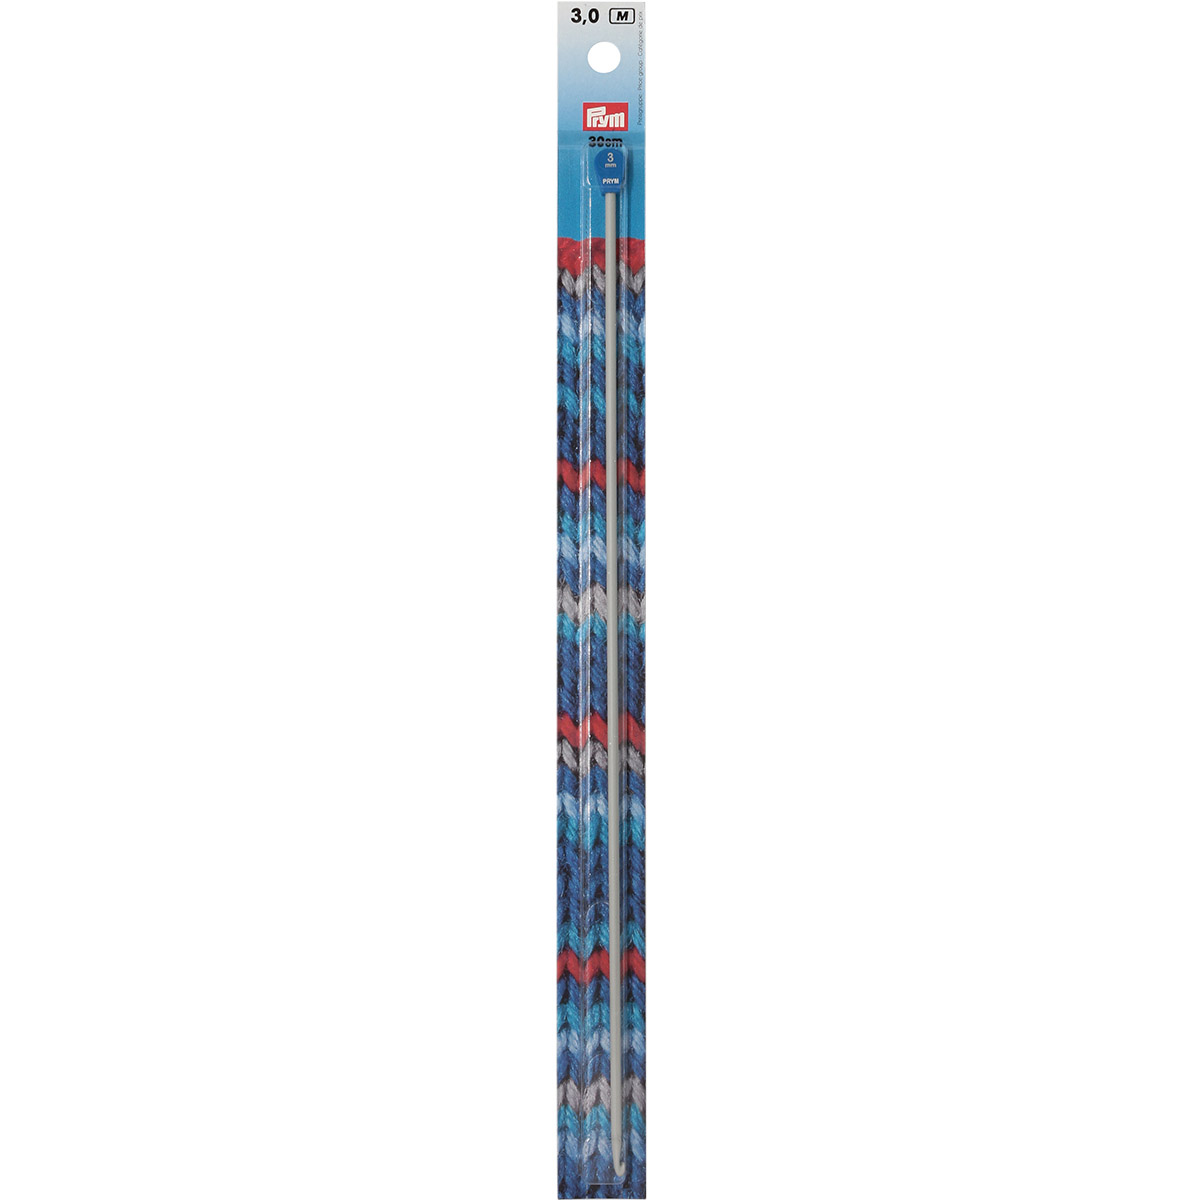 195215 Крючок для вязания тунисский, 3 мм*30 см, Prym